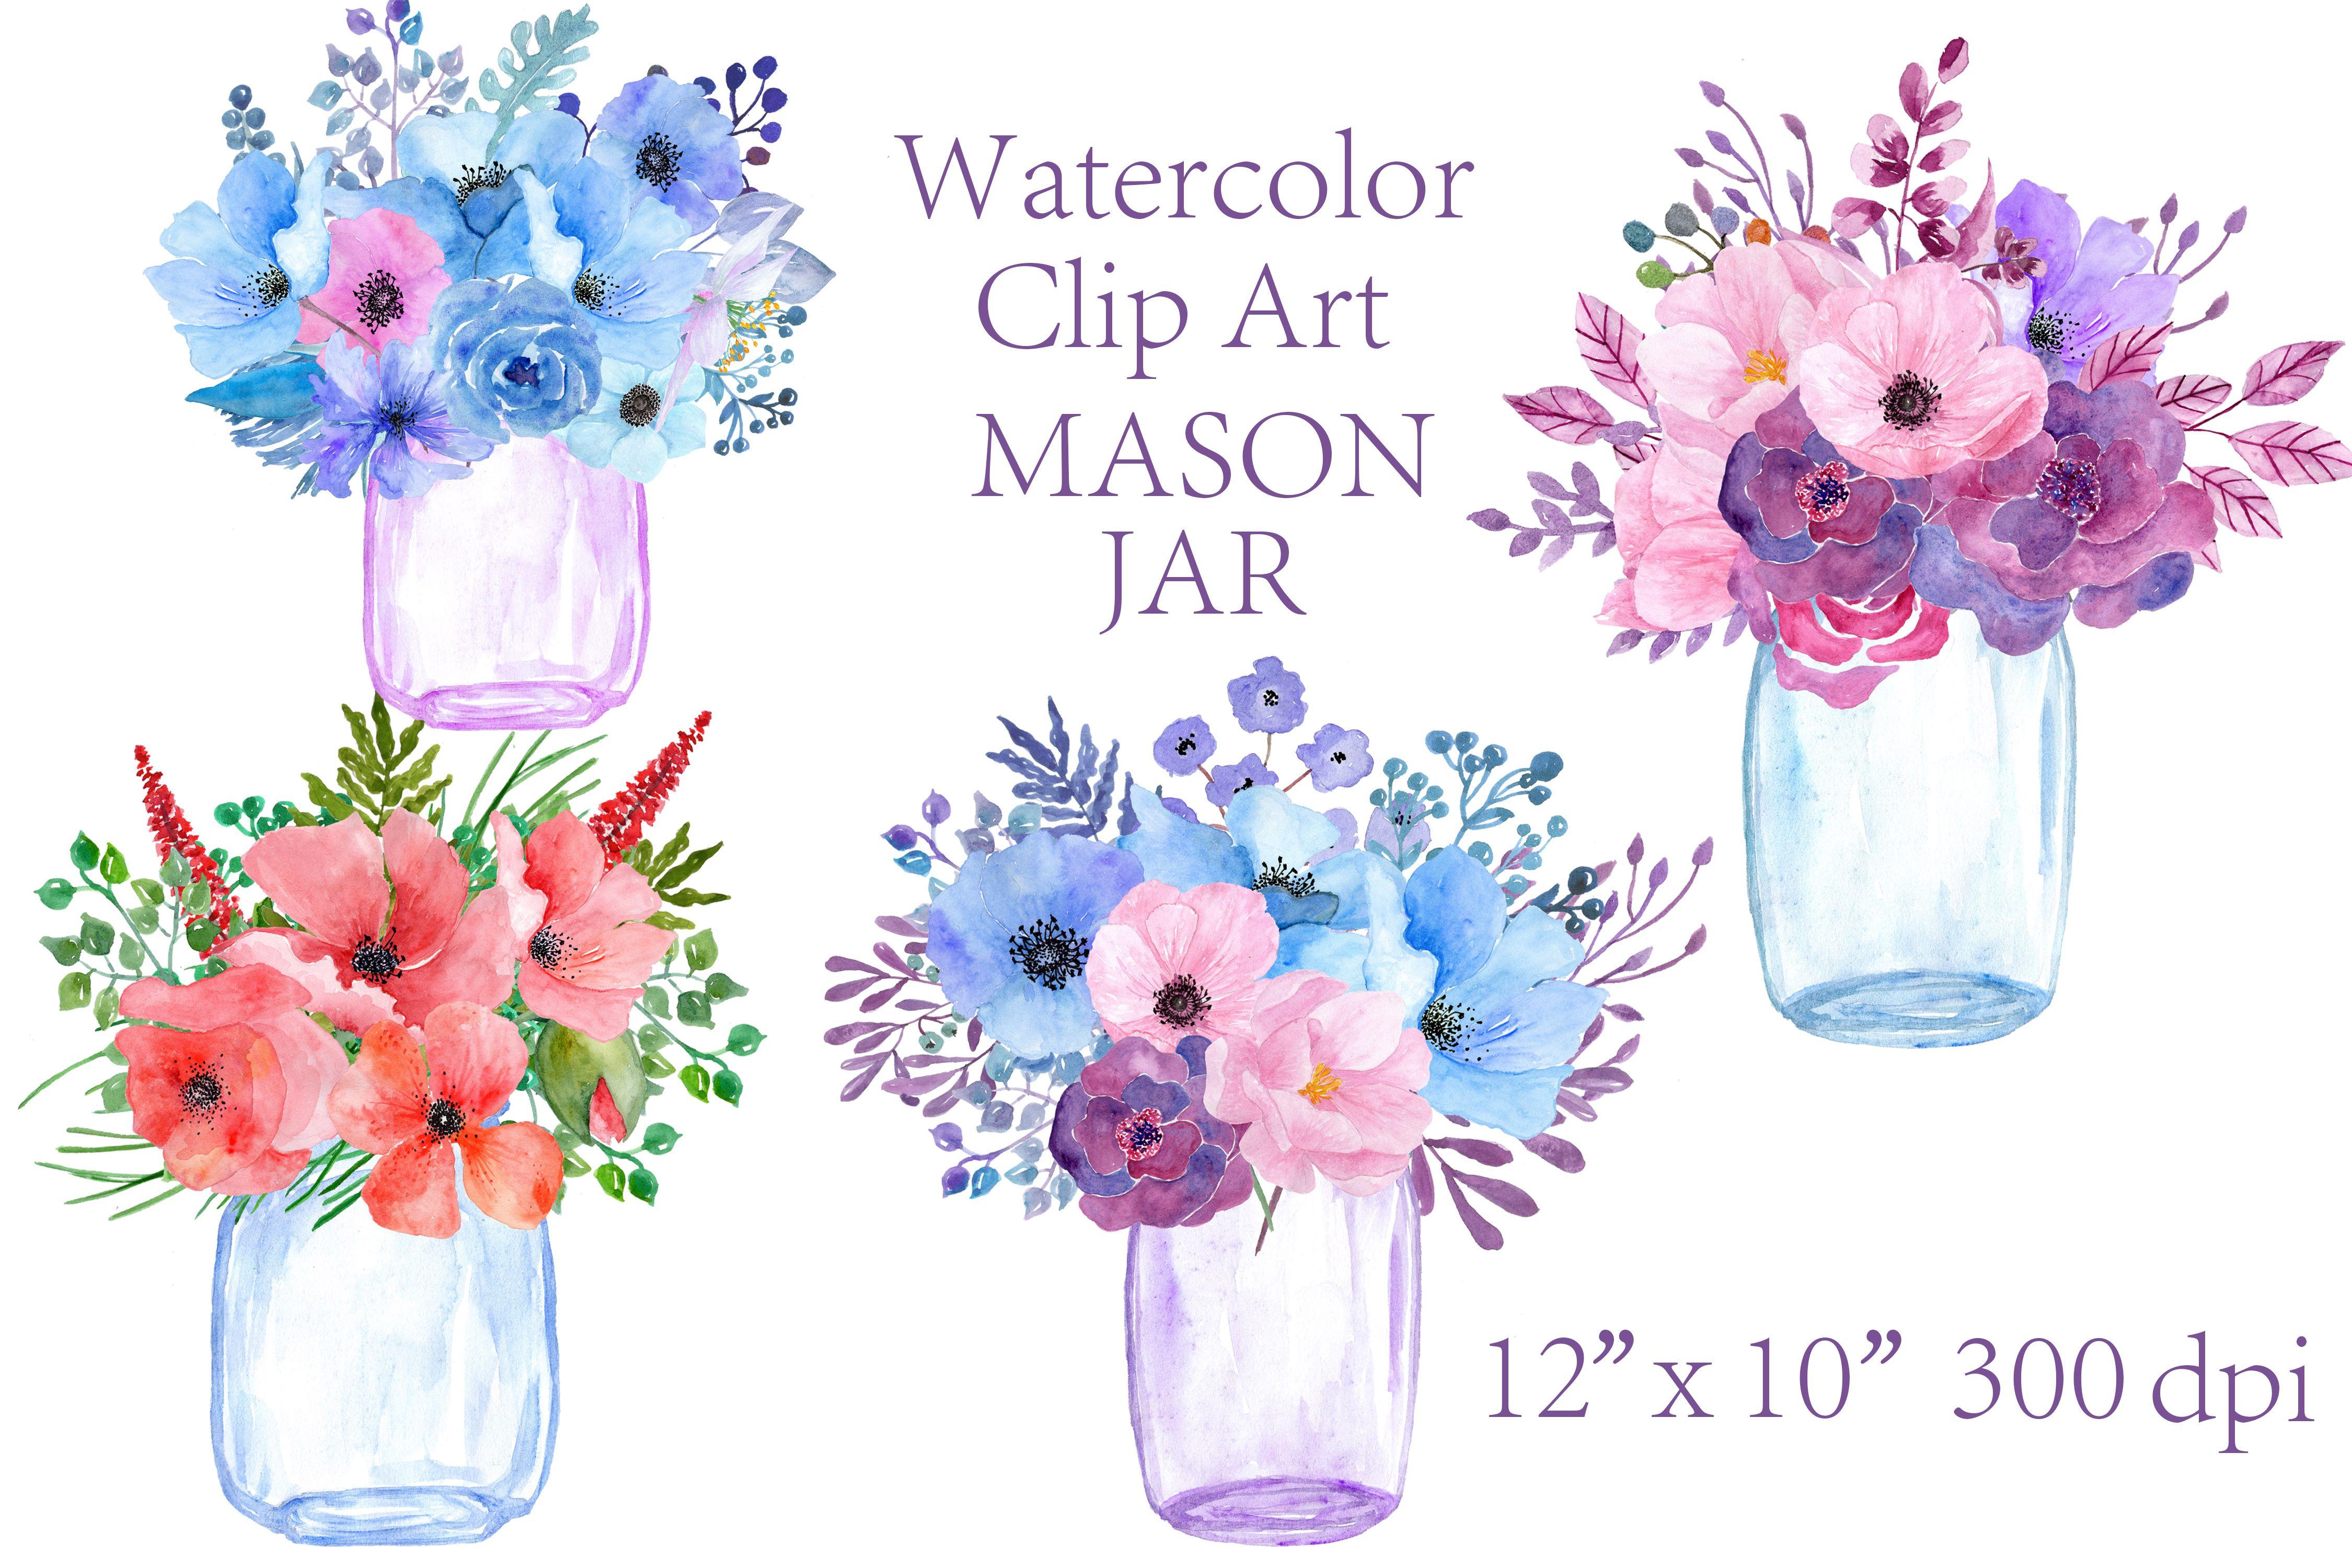 Watercolor Floral Mason Jars Clipart Floral Watercolor Clip Art